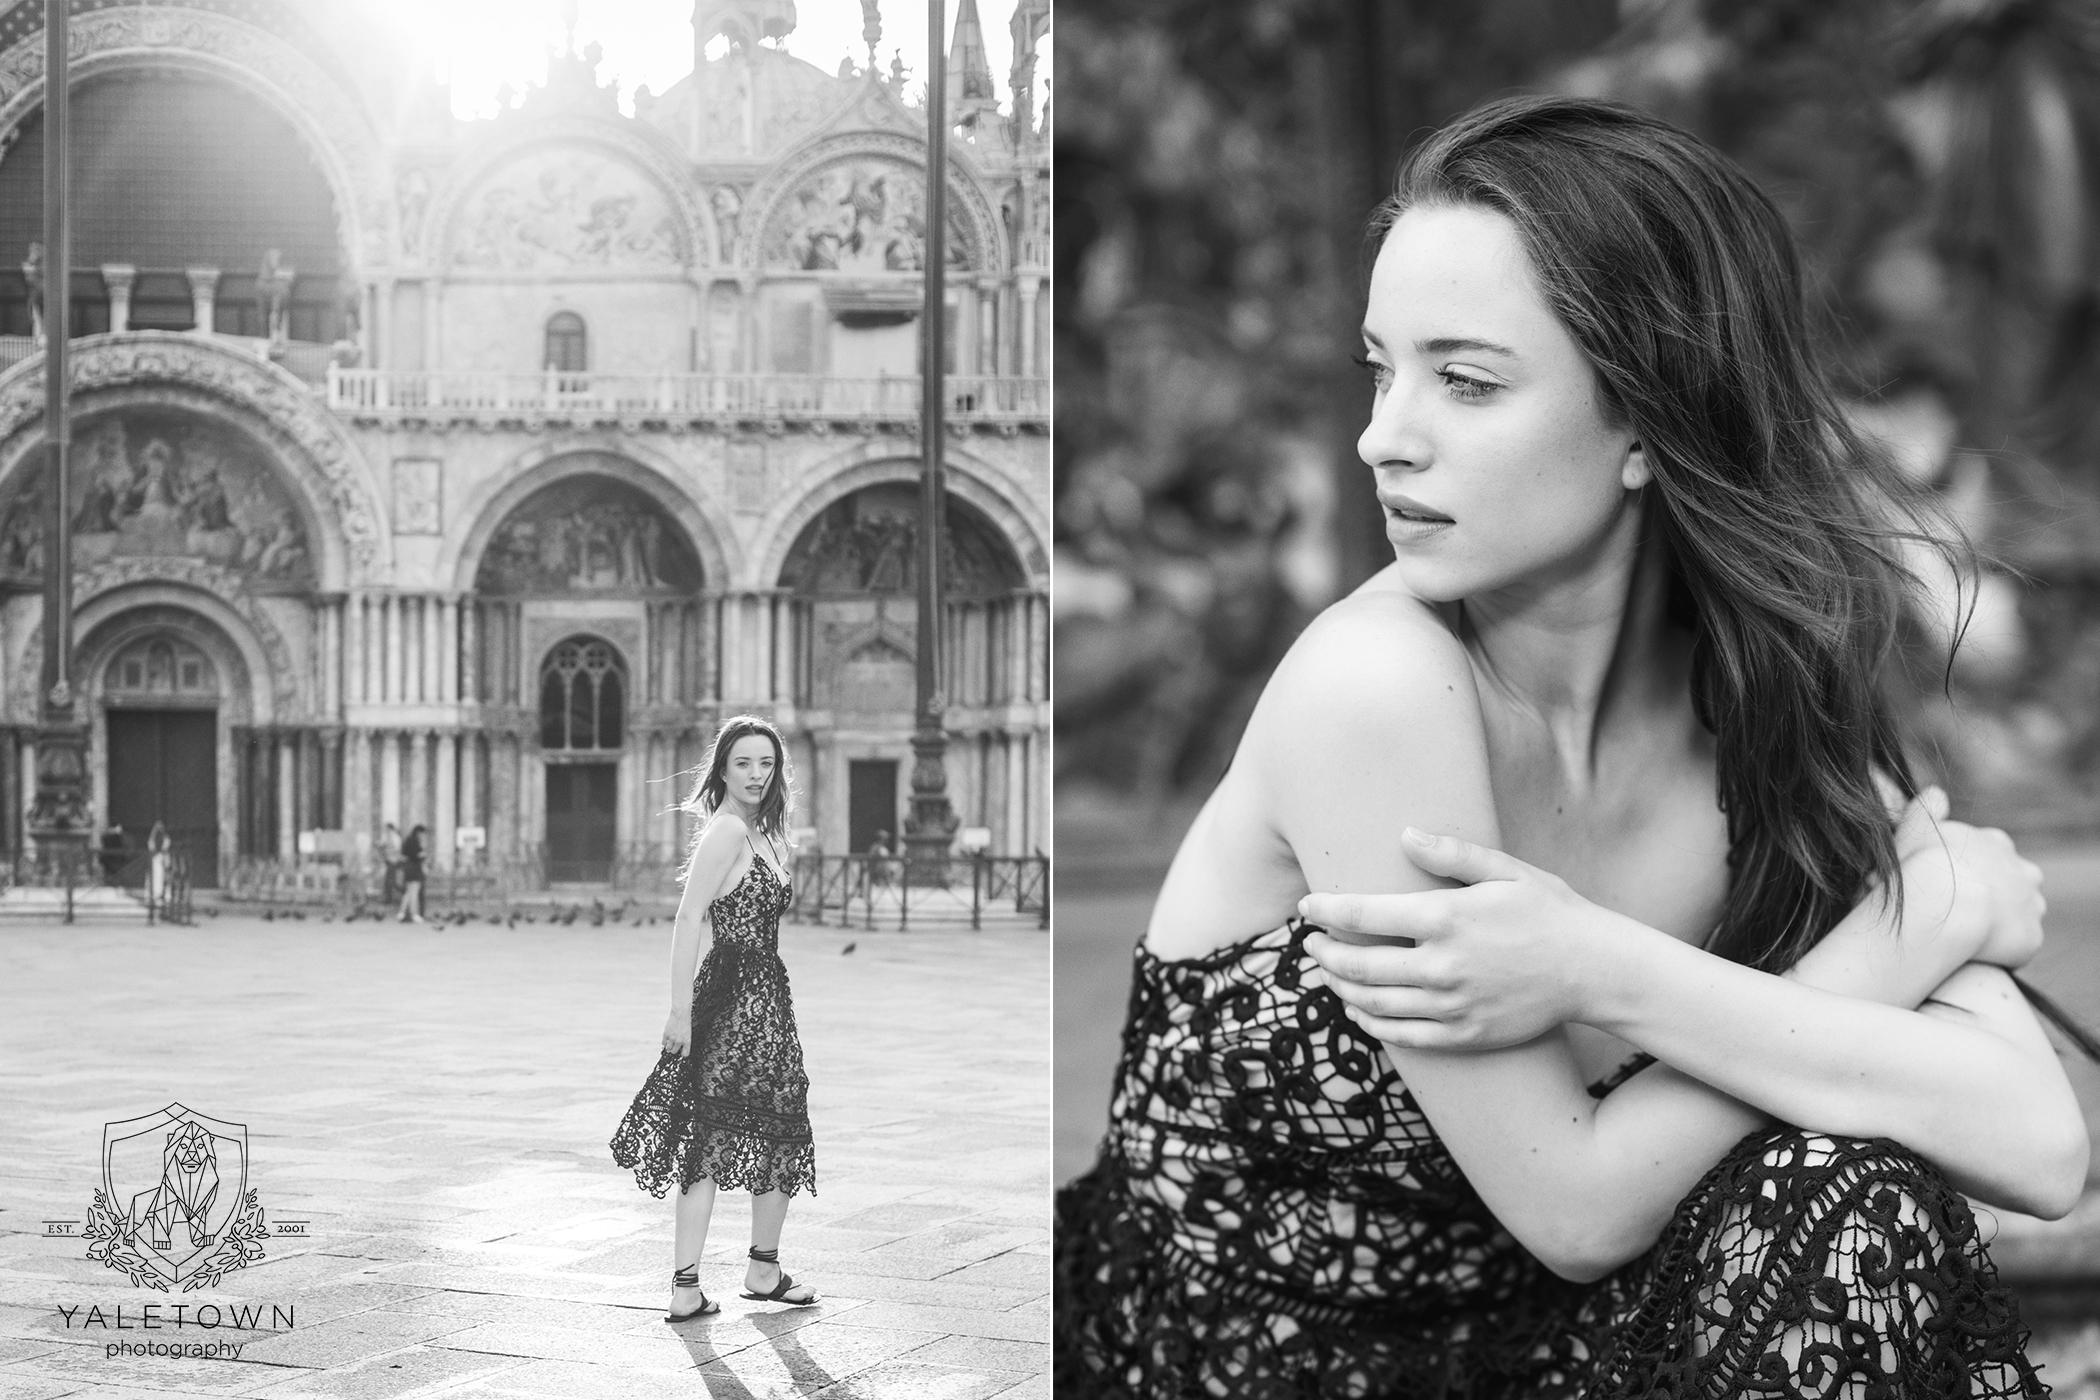 Venice-portrait-session-yaletown-photography-vacation-photographer-photo-009.jpg